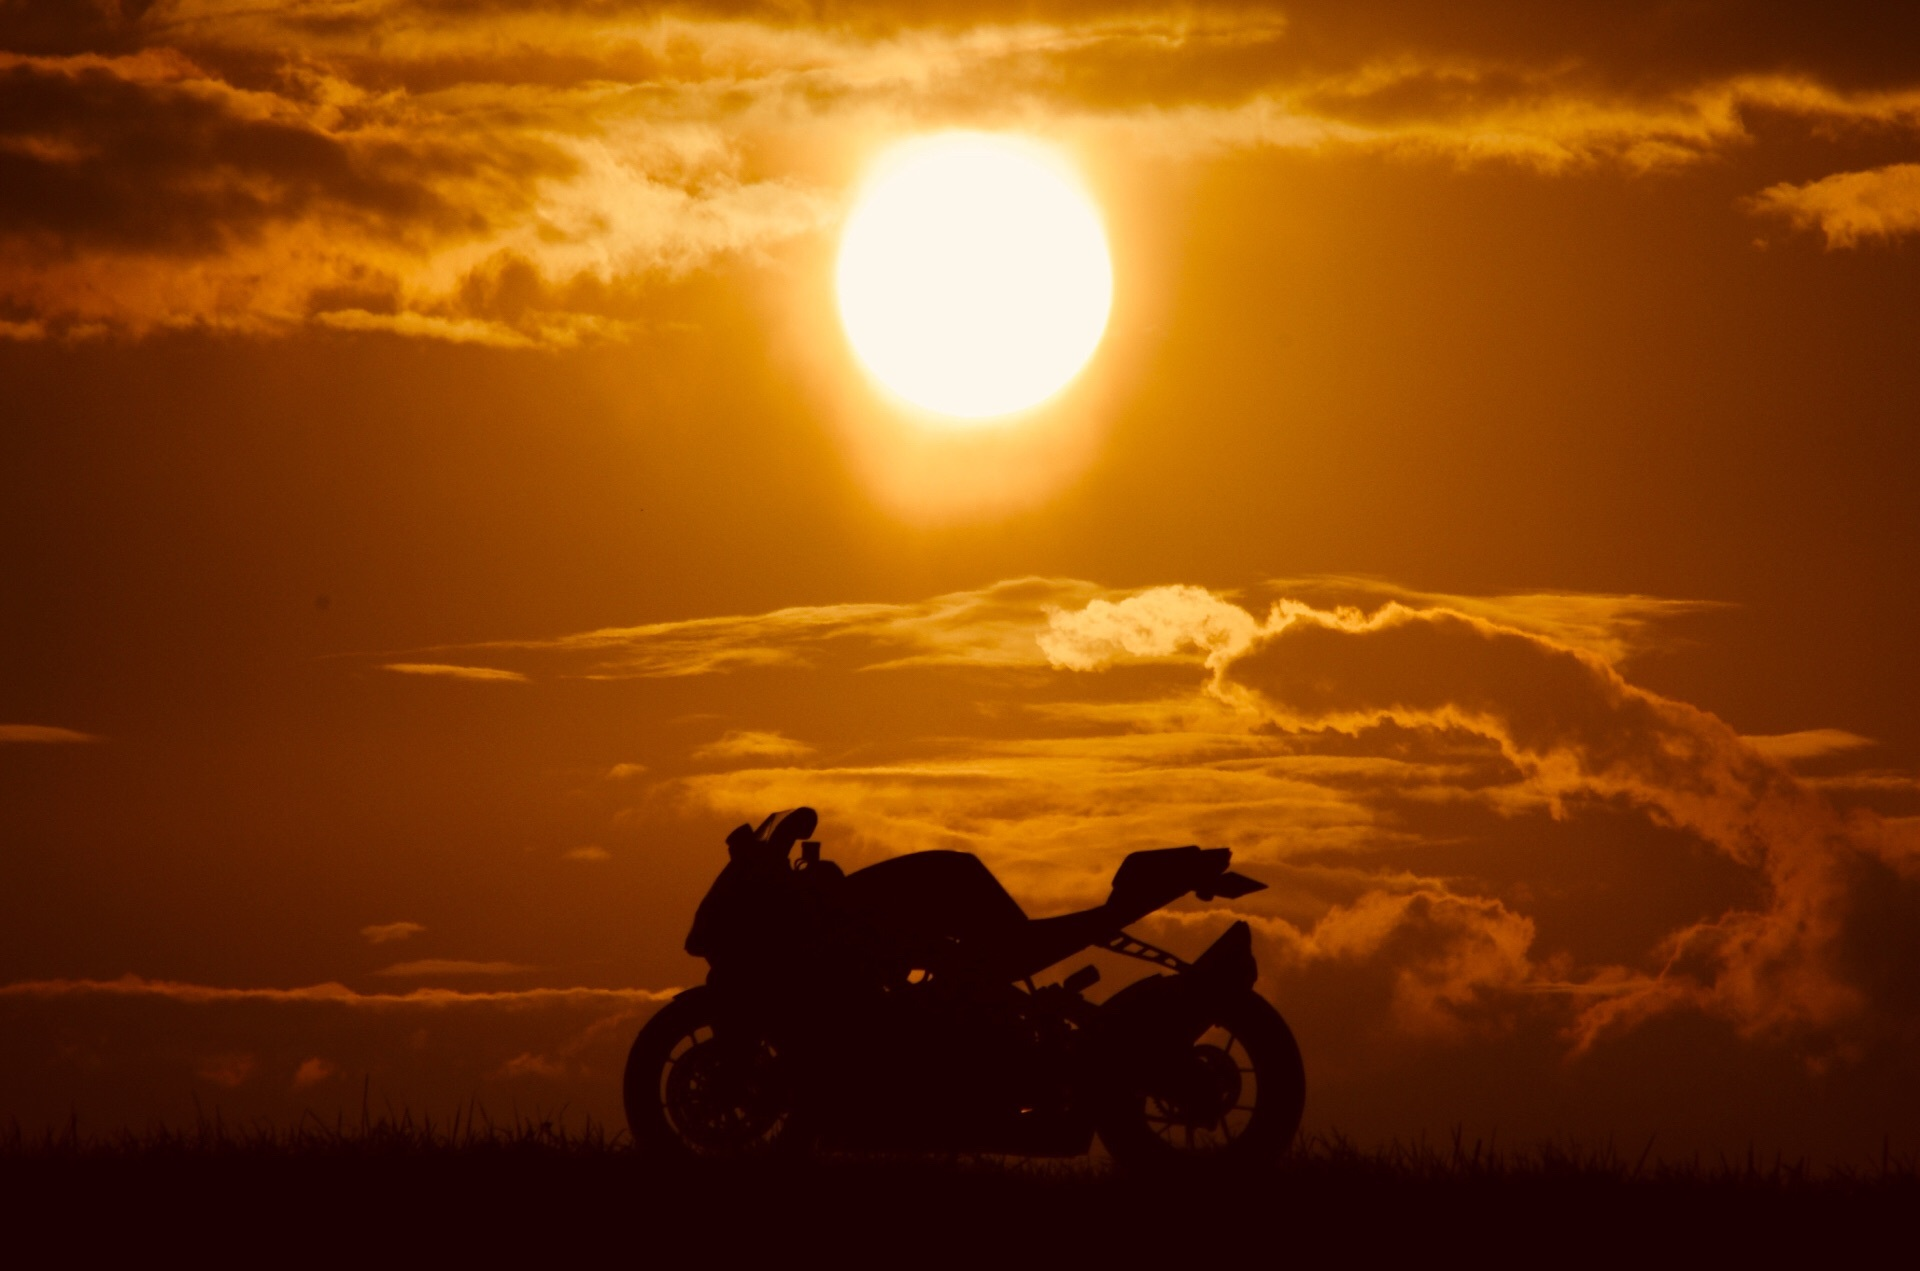 【DB7】Rising Sunの種明かし_e0159646_07592379.jpeg